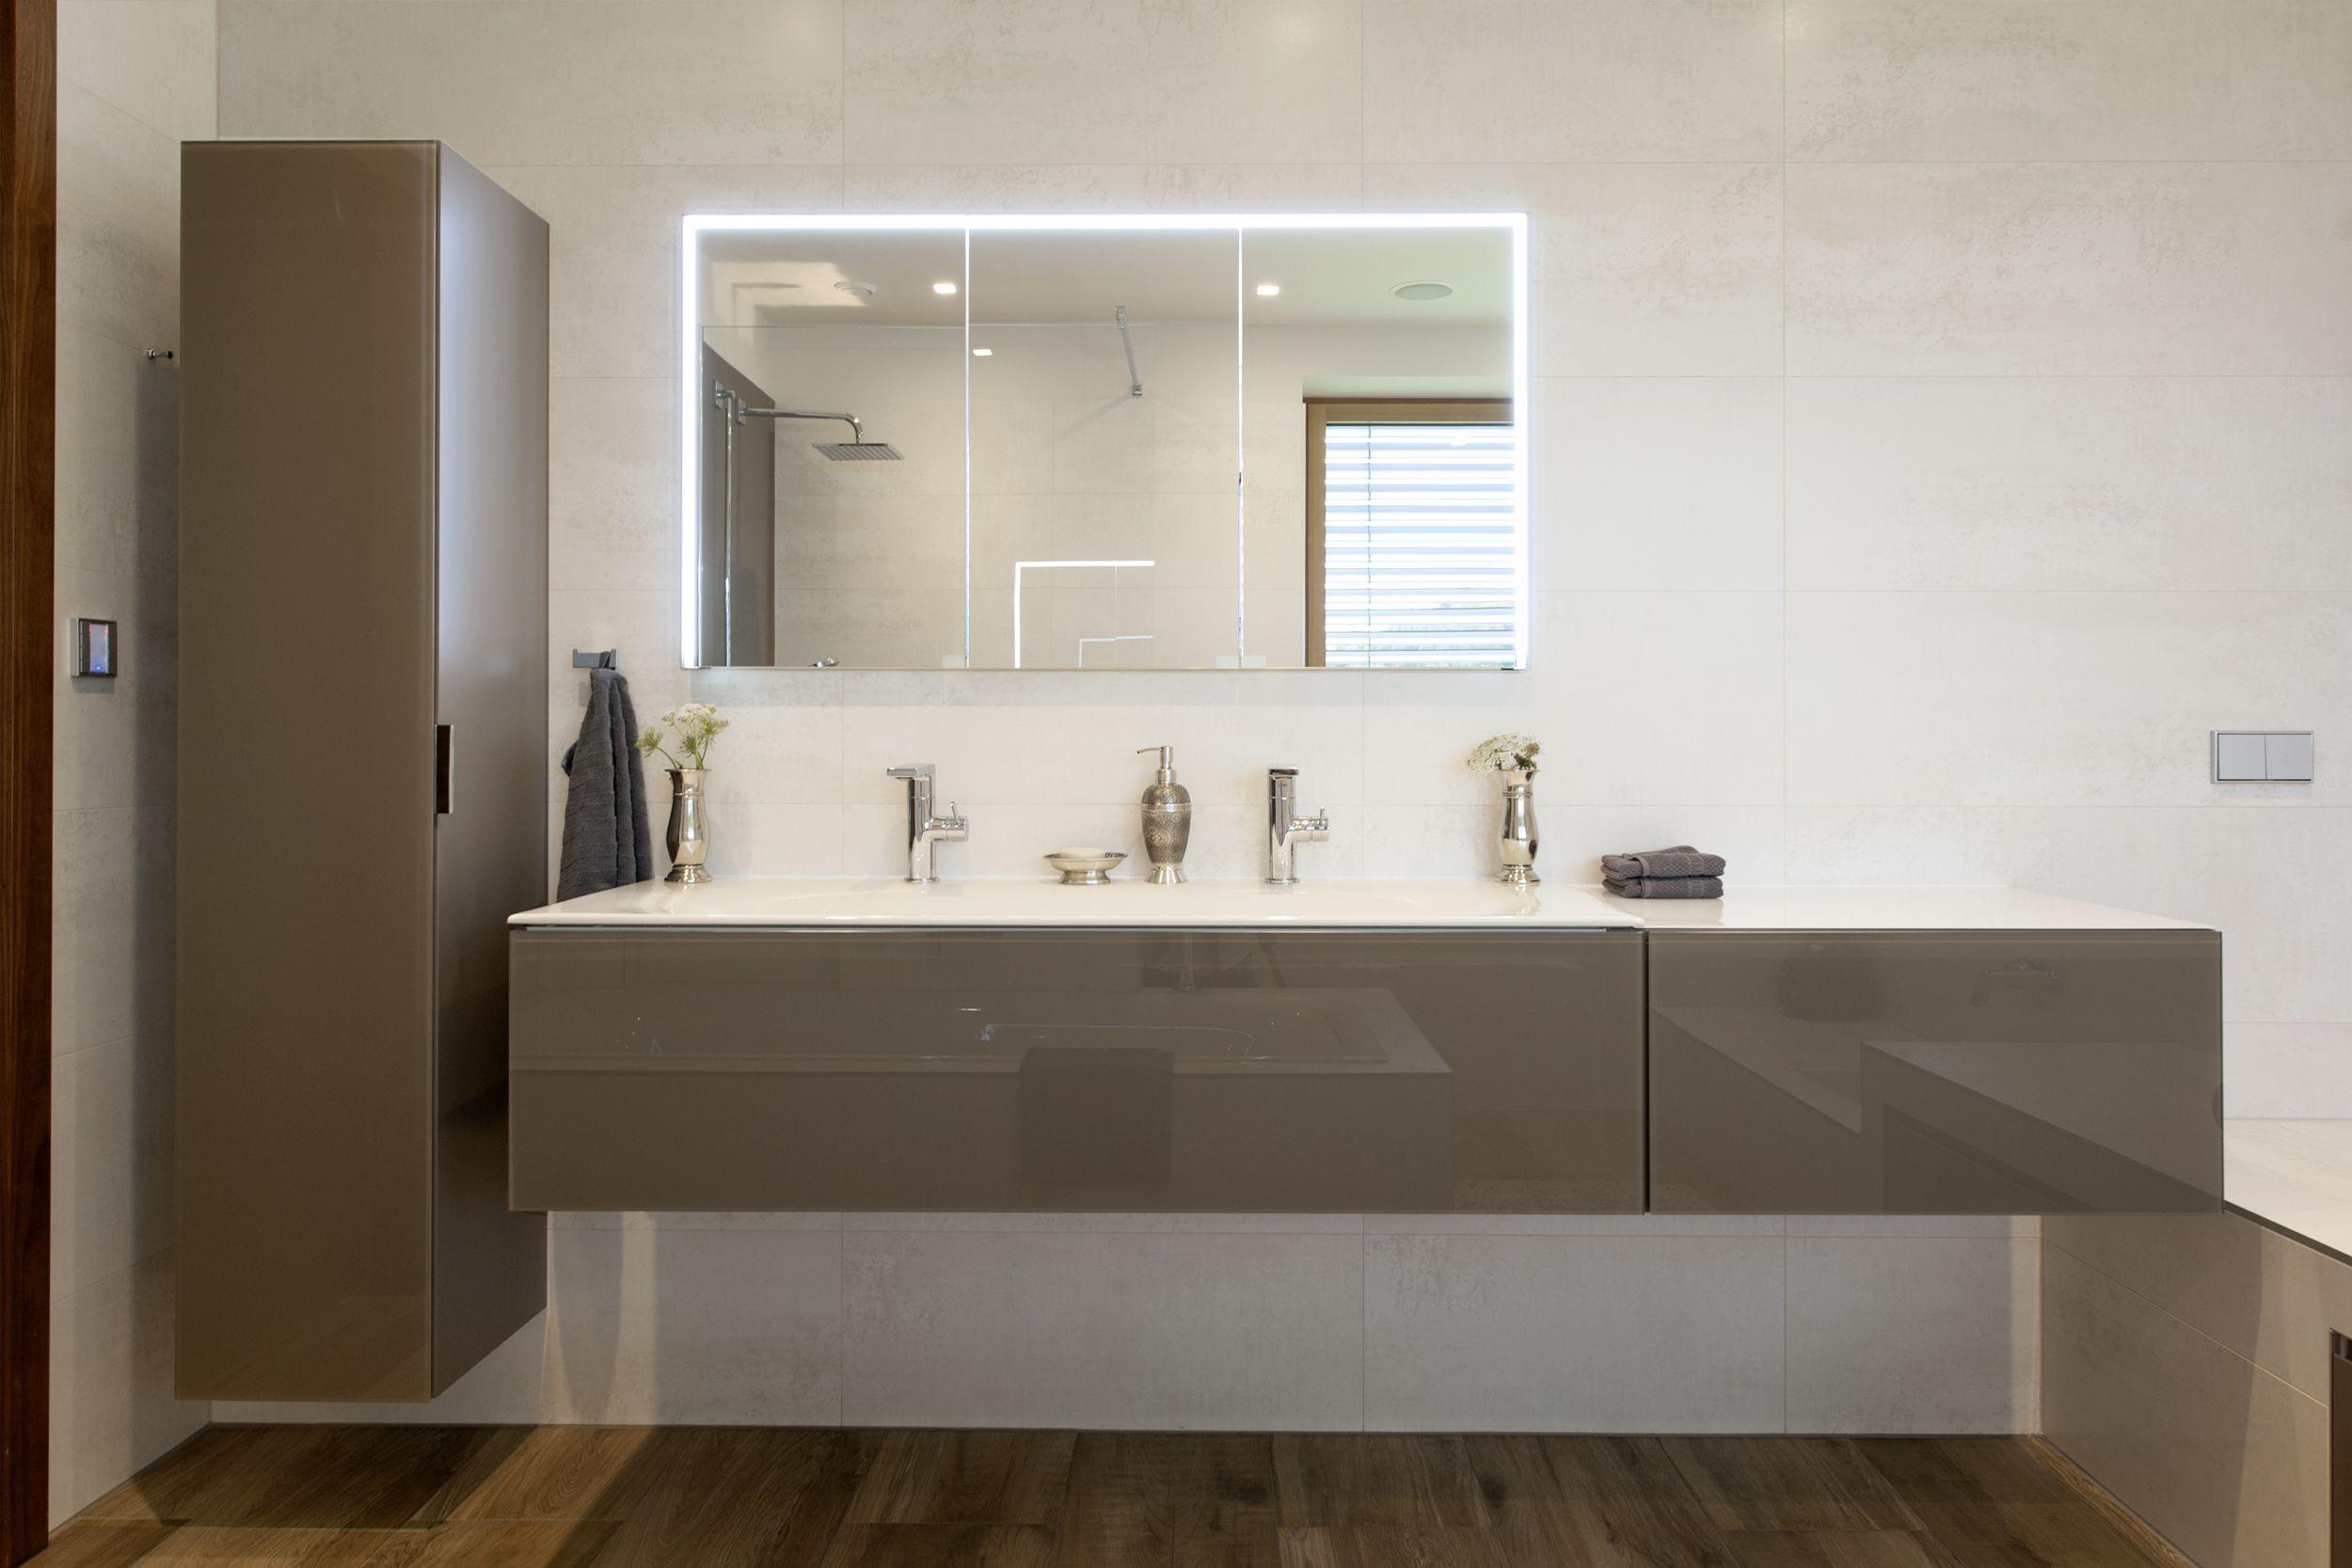 Inspirieren Lassen Auf Badezimmer Com In 2020 Spiegelschrank Bad Badezimmer Spiegelschrank Spiegelschrank Beleuchtung